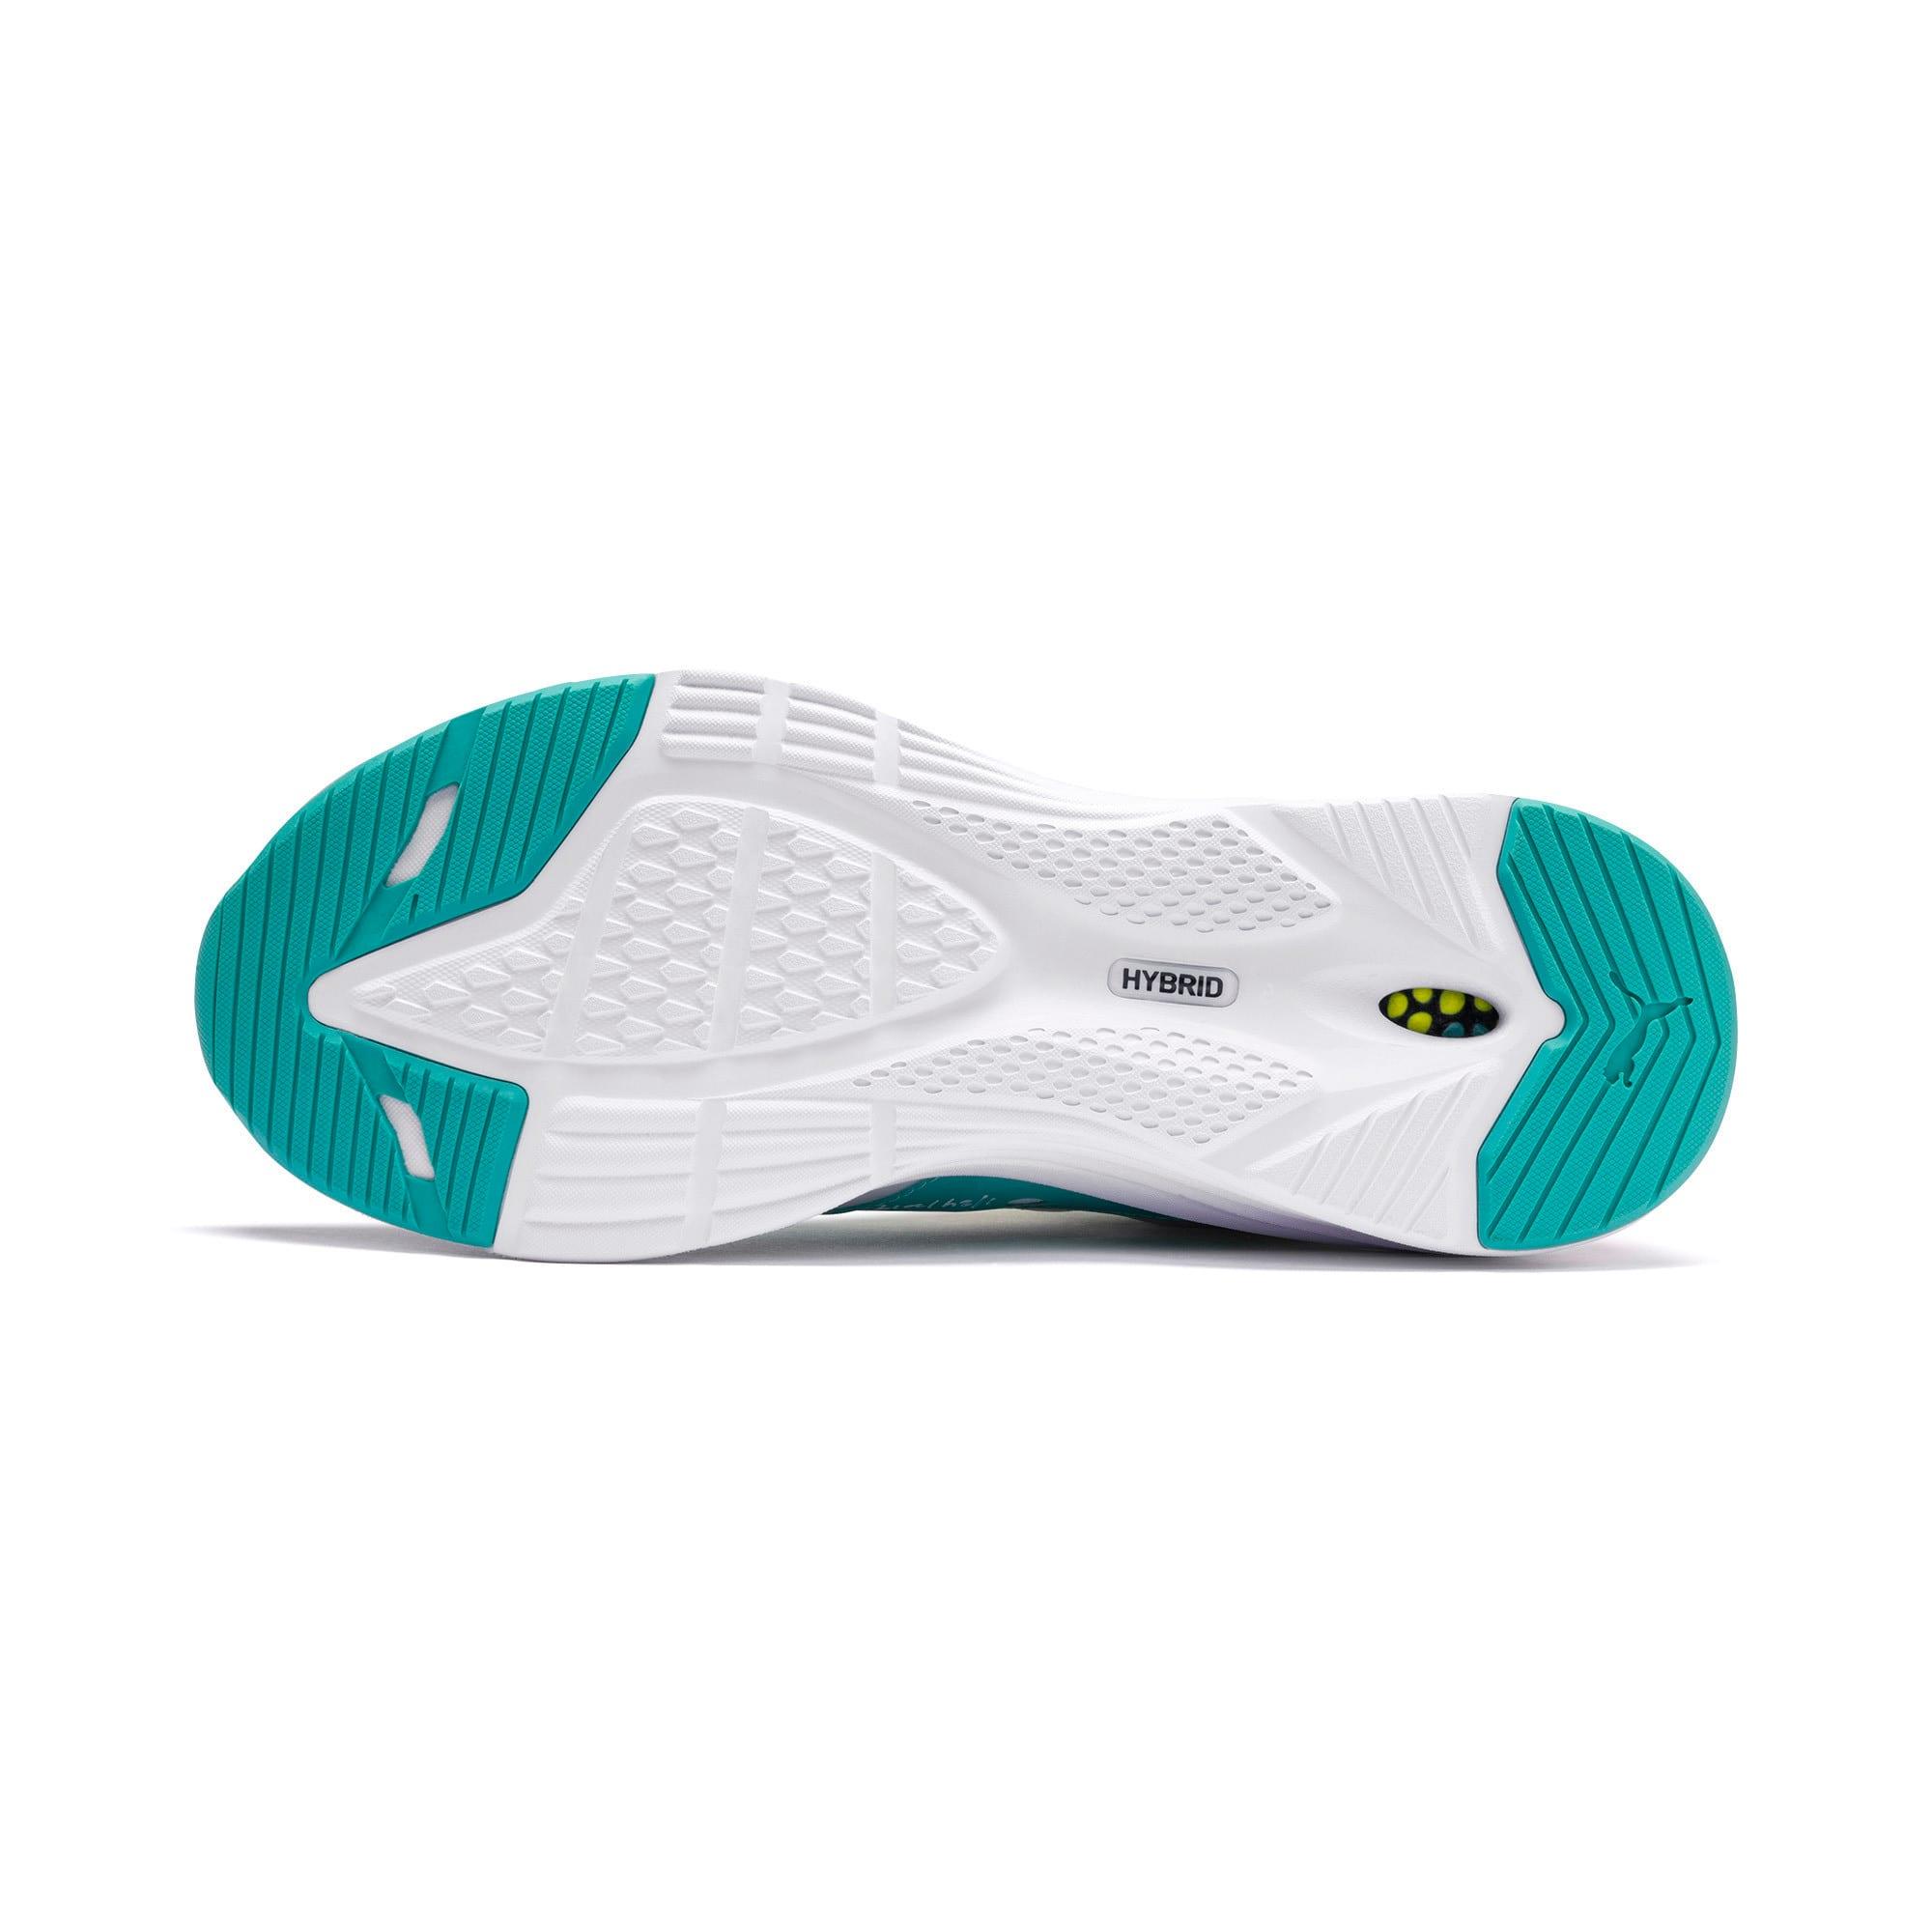 Thumbnail 4 of HYBRID Fuego Men's Running Shoes, White-Nrgy Rose-Yellow Alert, medium